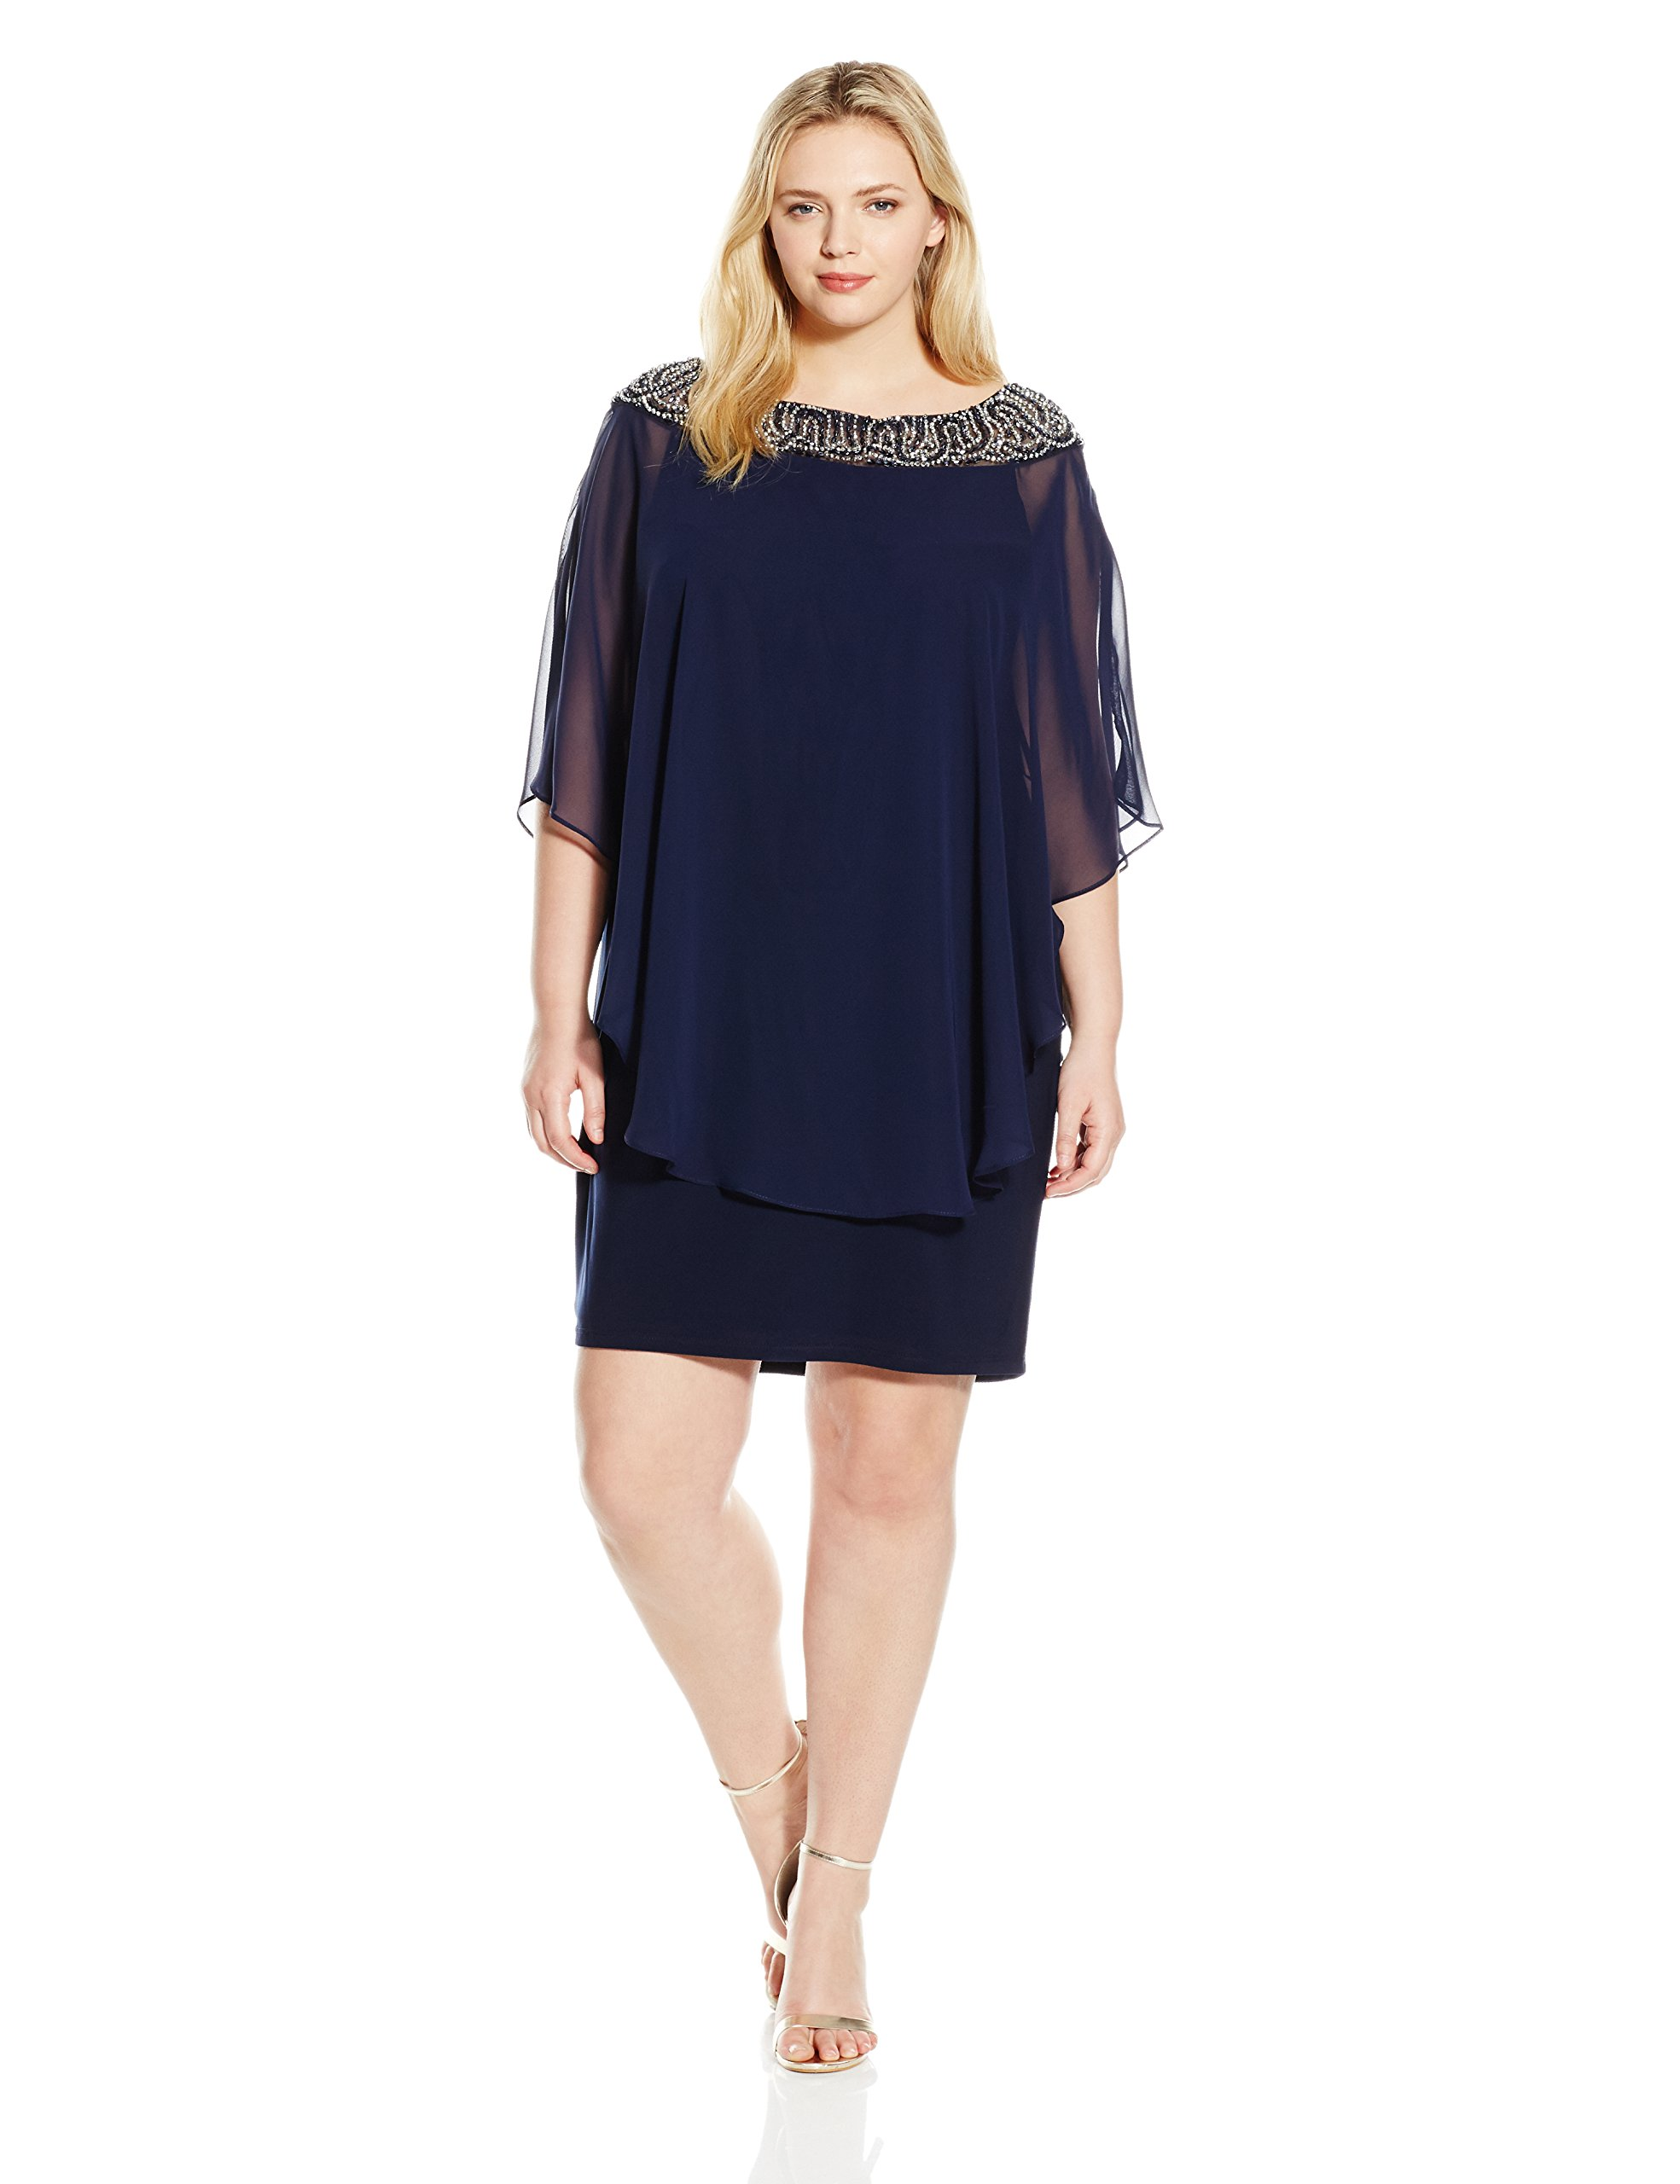 Xscape Women's Plus Size Short Chiffon Overlay W/ Bead Top, Navy/Silver/Navy, 18W